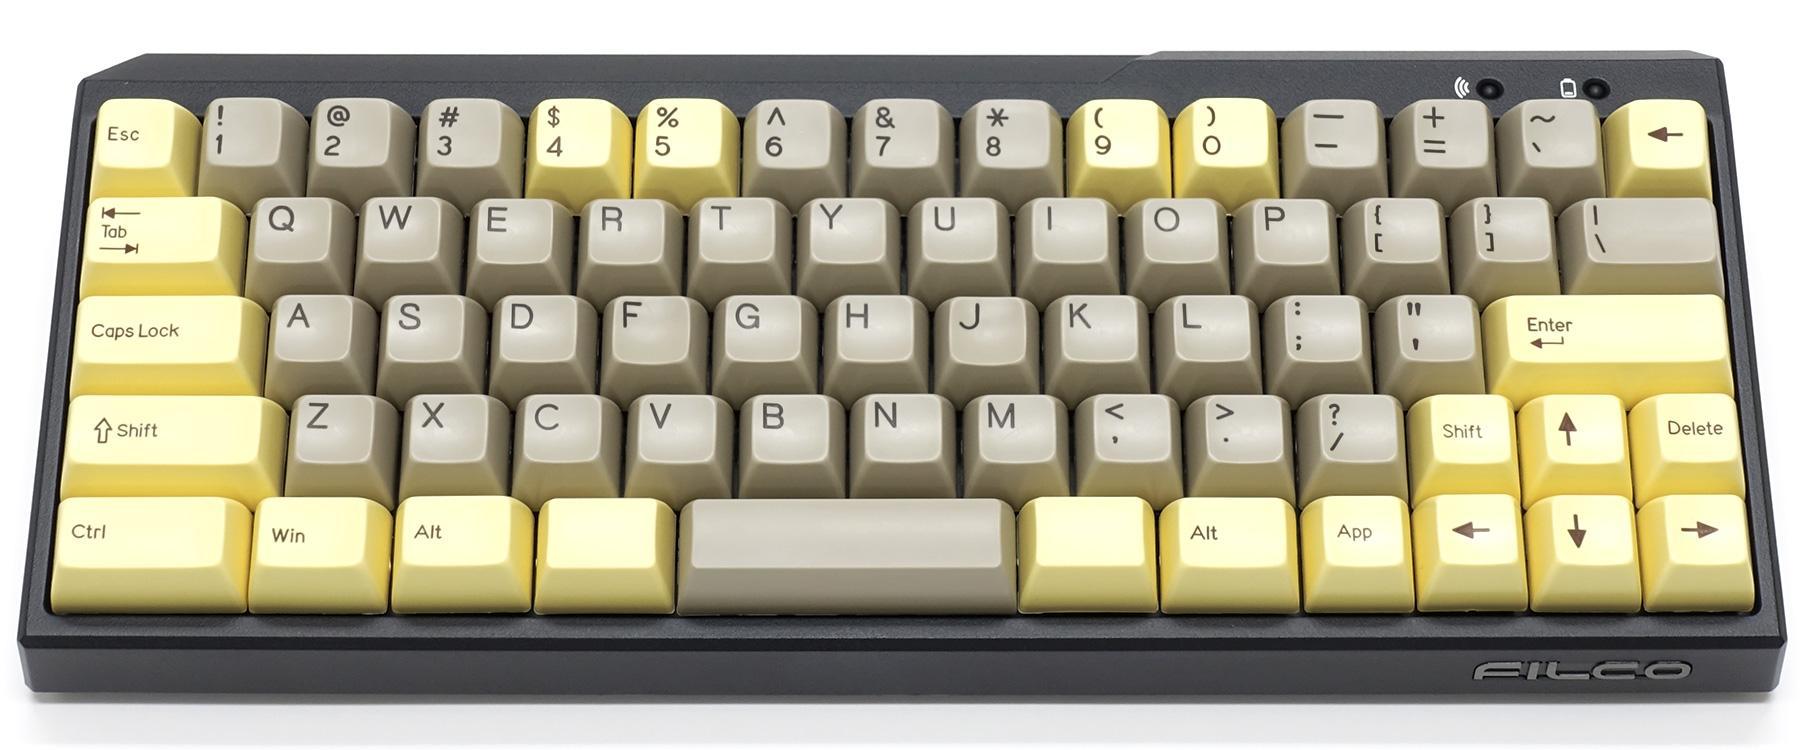 72-Key ABS Doubleshot MINILA Keycap Set - Custard x Chocolate (Filco)